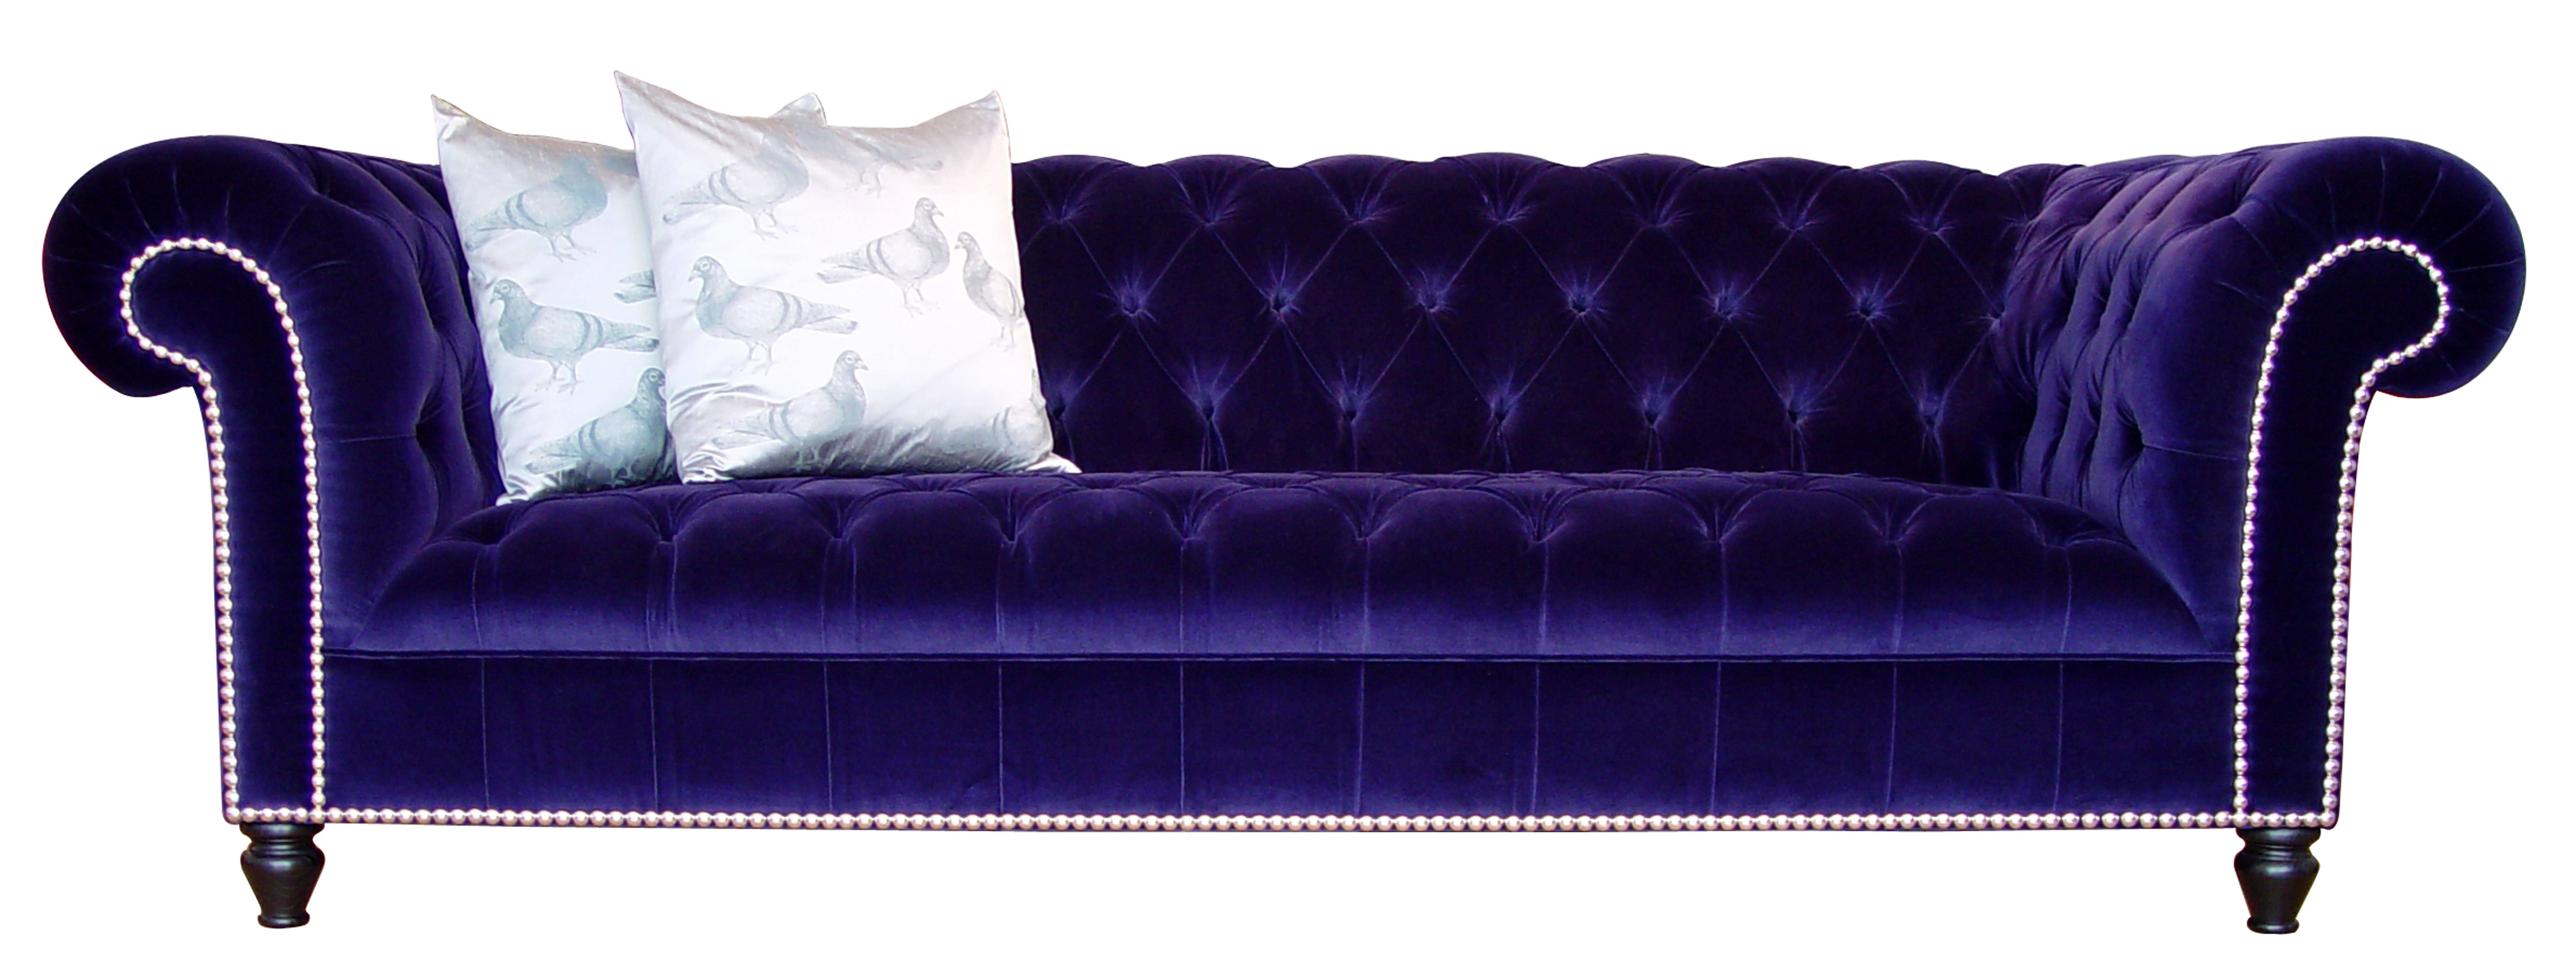 Purple Velvet Sofas – Thesofa regarding Velvet Purple Sofas (Image 21 of 30)